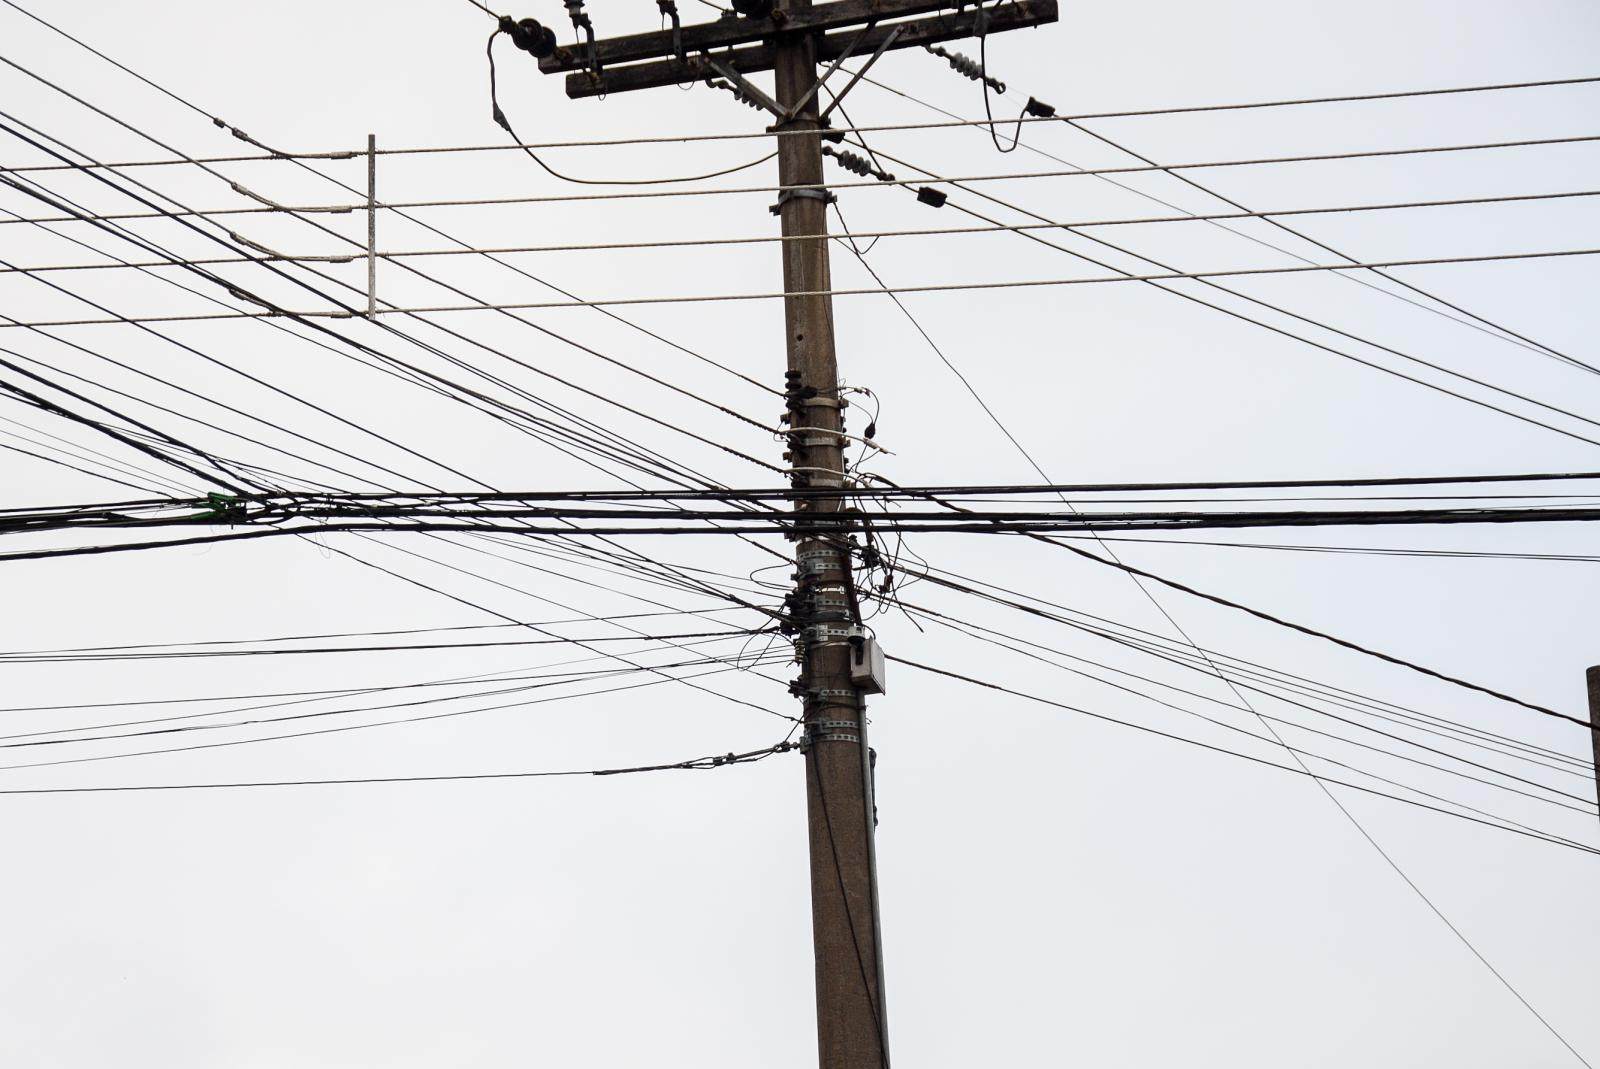 Fraudes na rede elétrica têm queda de 35%